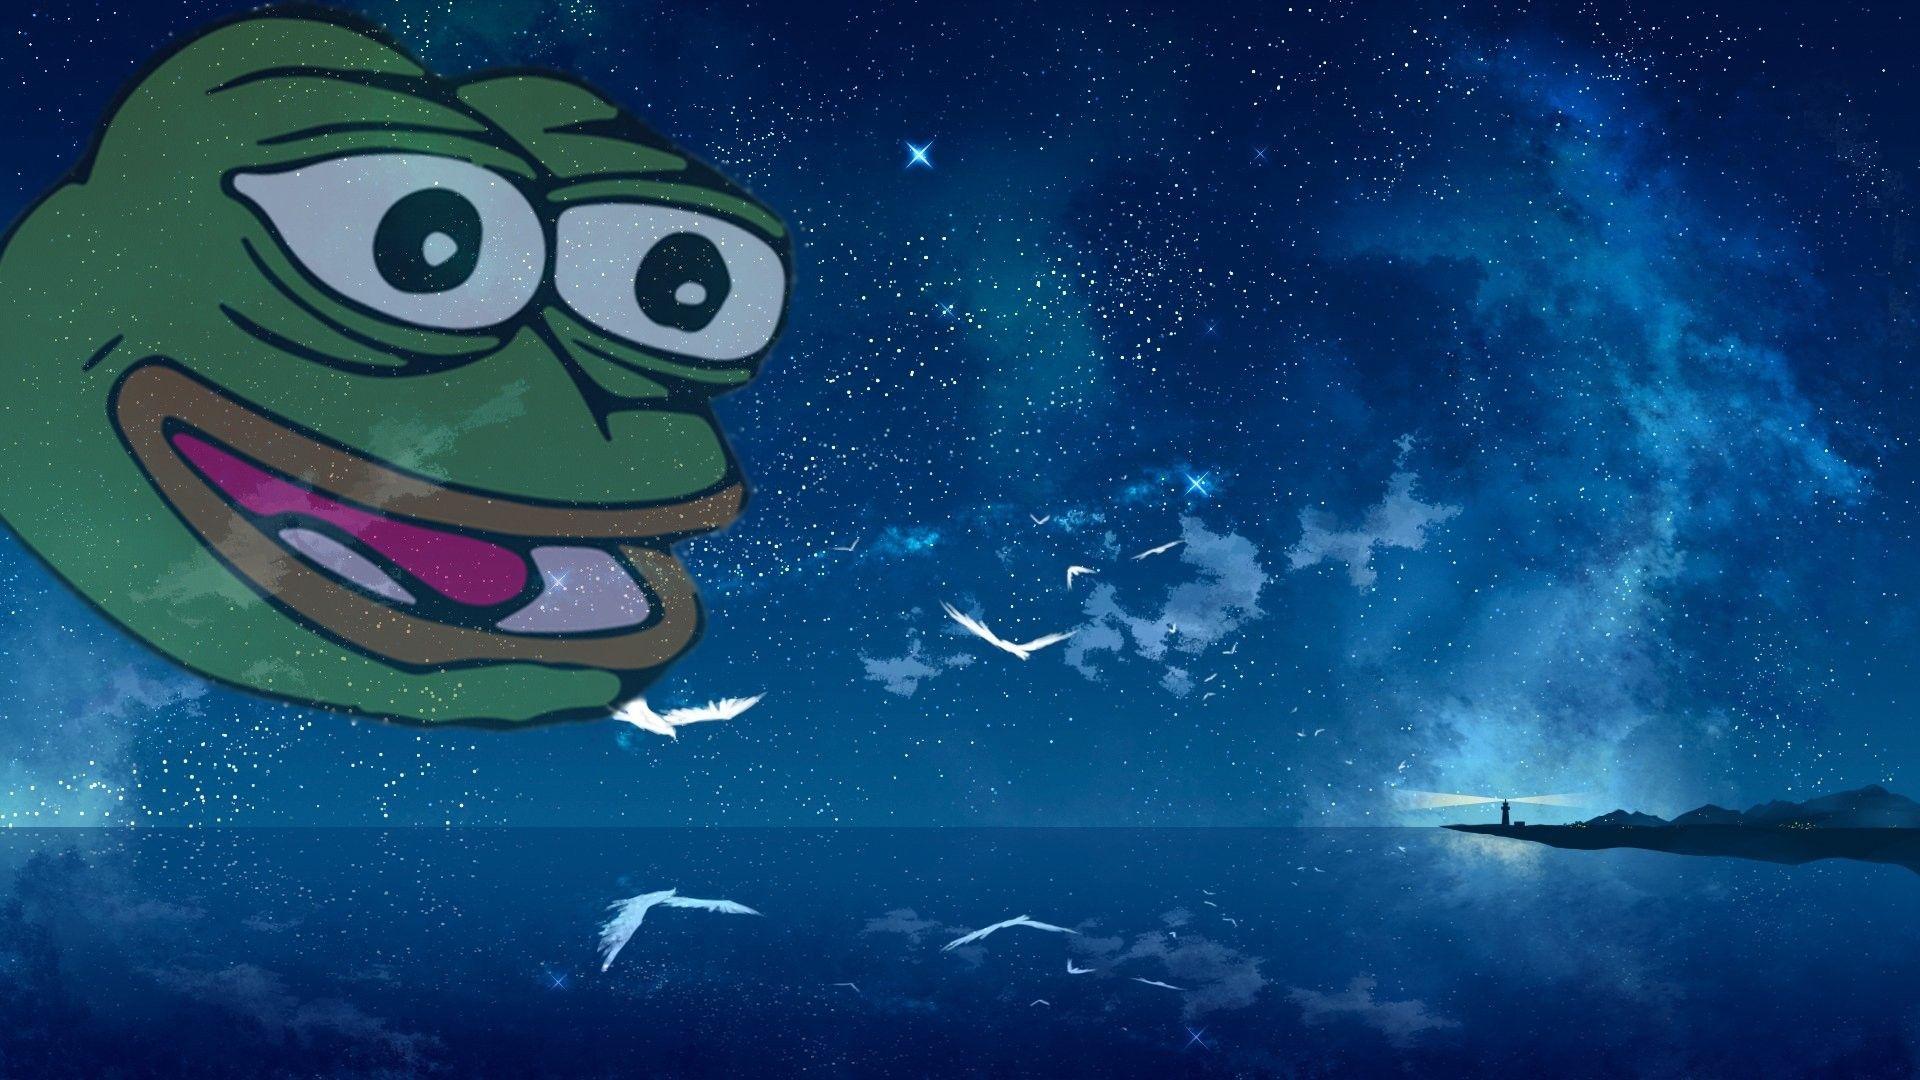 Pepe Wallpapers on WallpaperDog